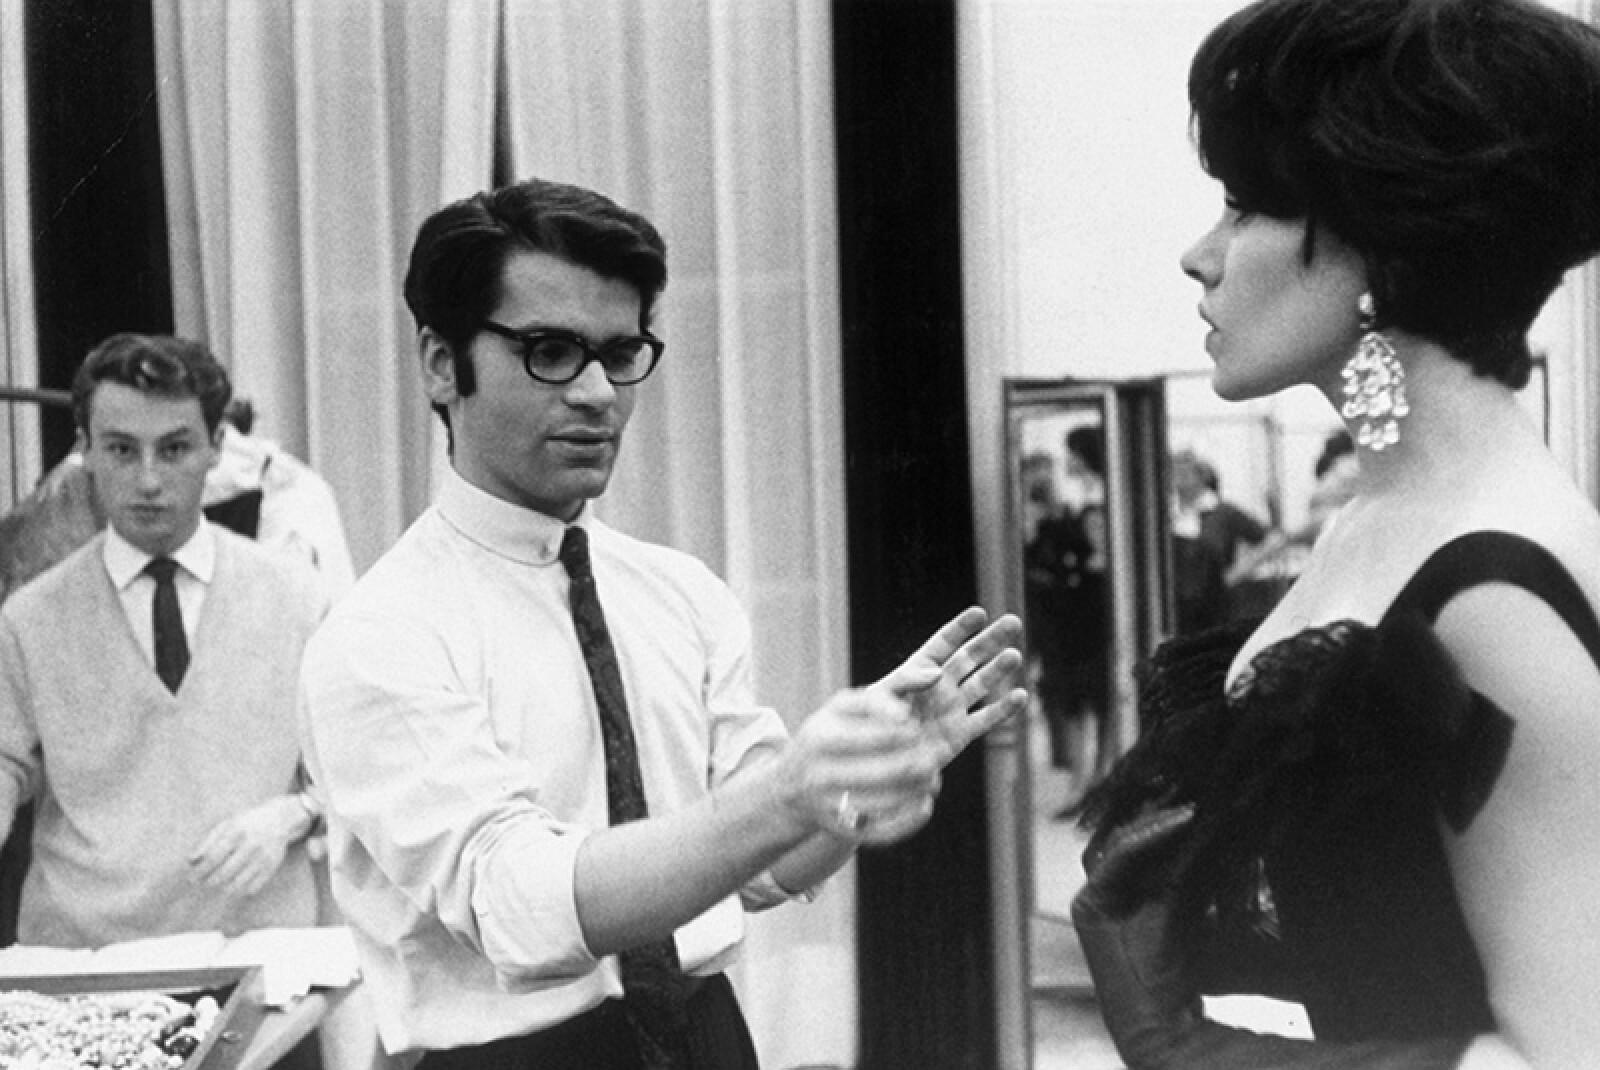 Karl Lagerfeld - 1964